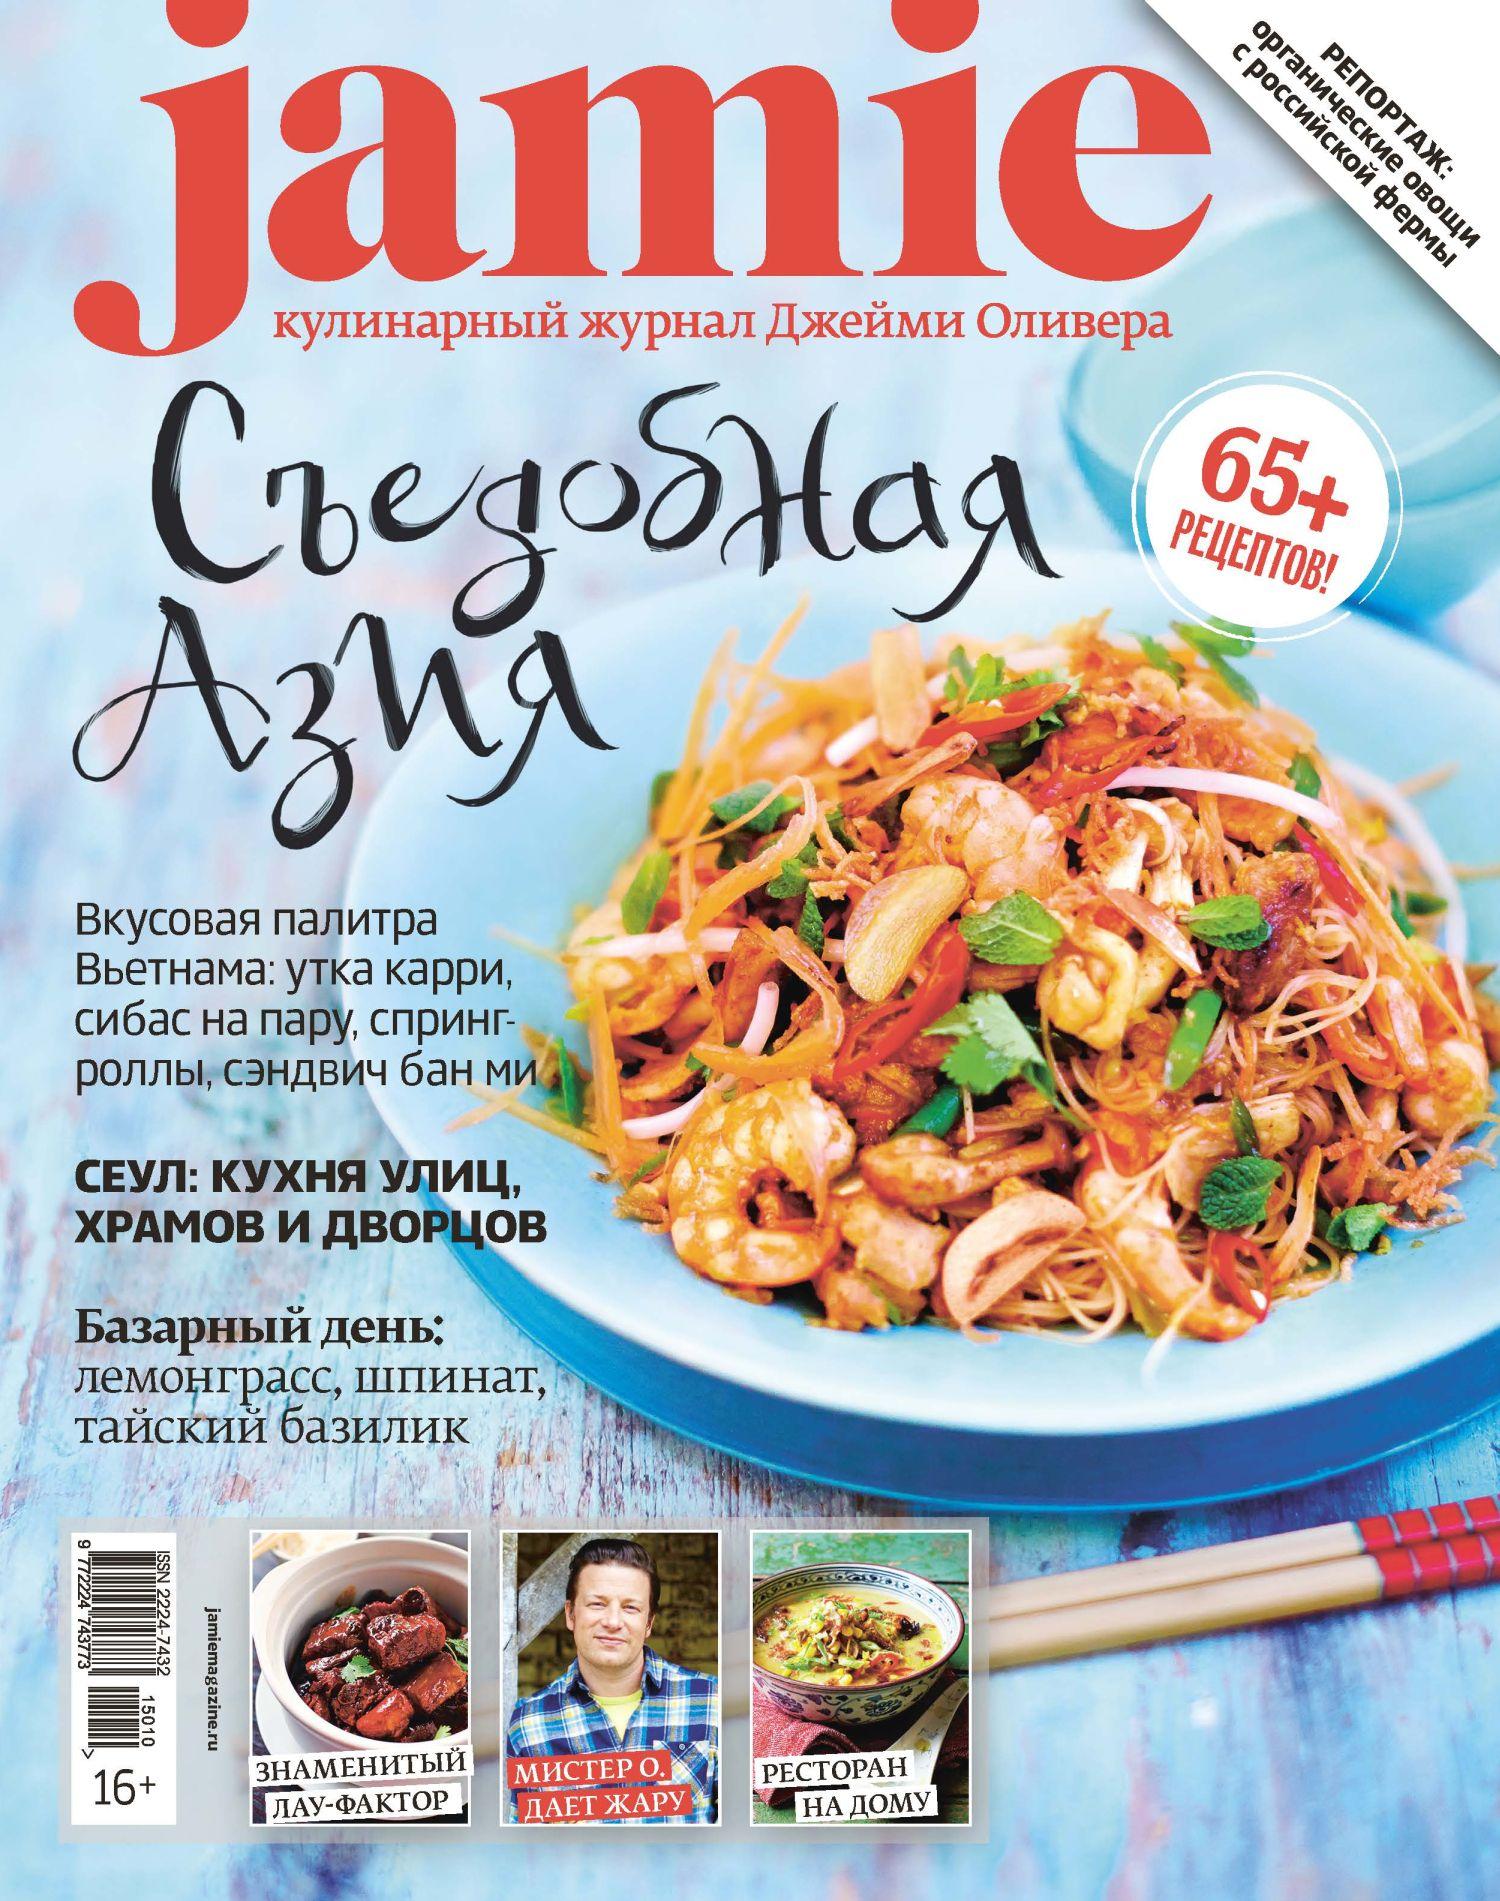 Журнал Jamie Magazine № 10 октябрь 2015 г